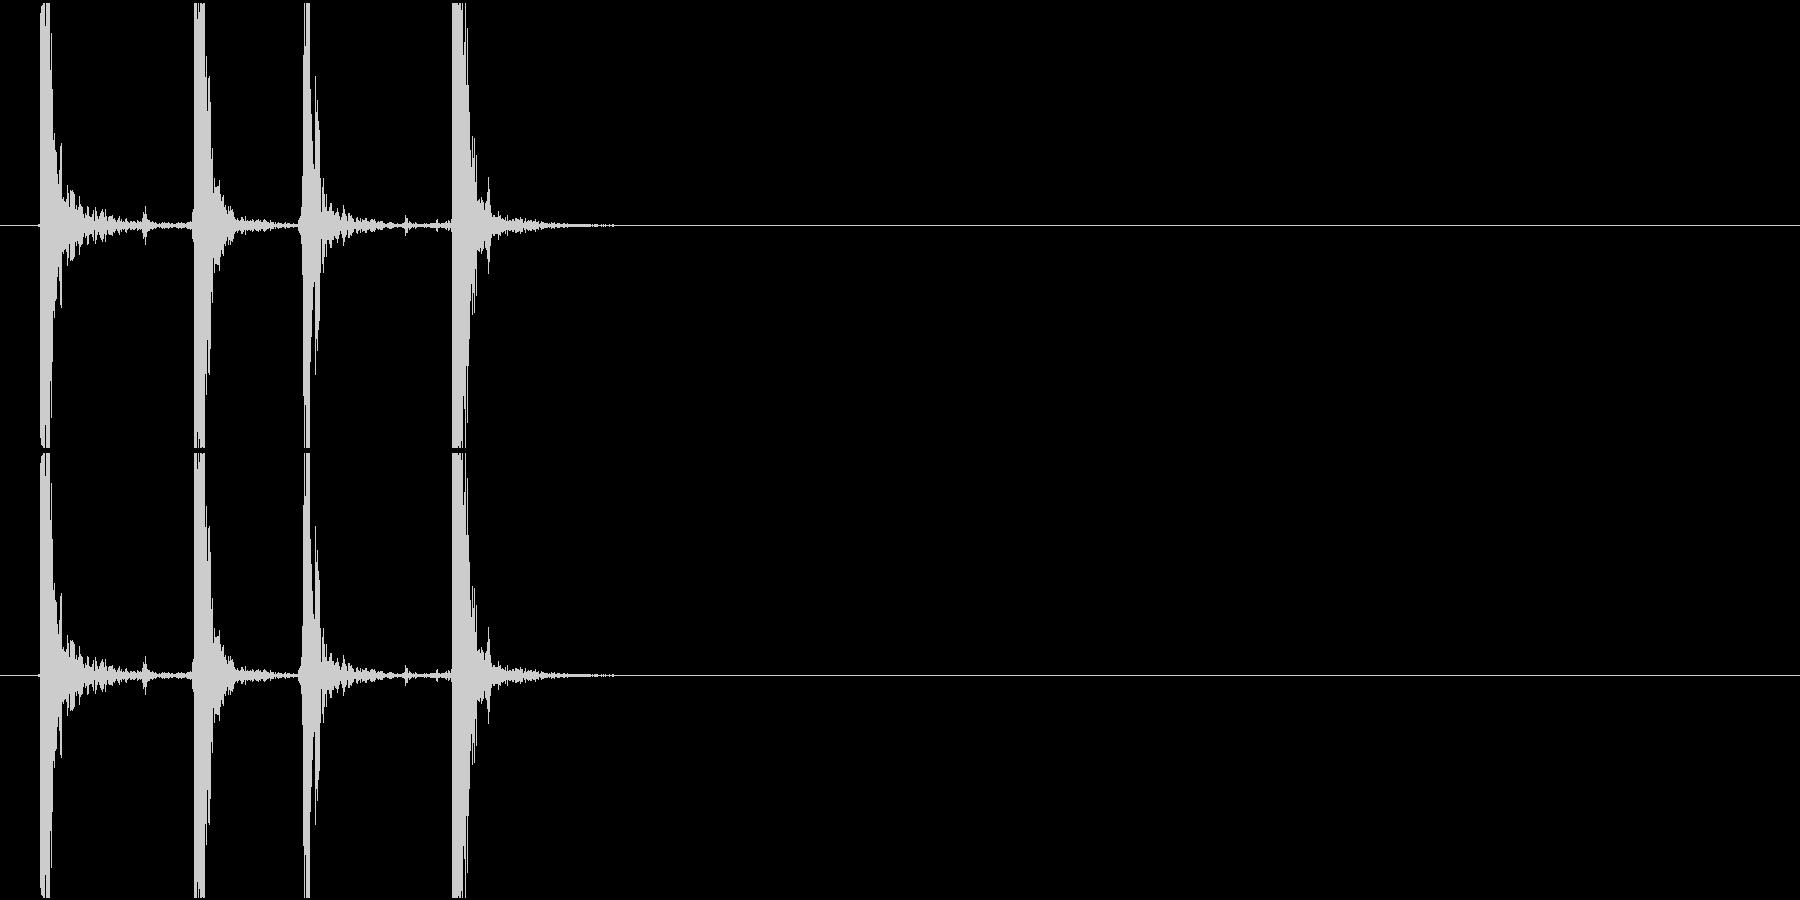 Typing キーボード 高速 2連打の未再生の波形